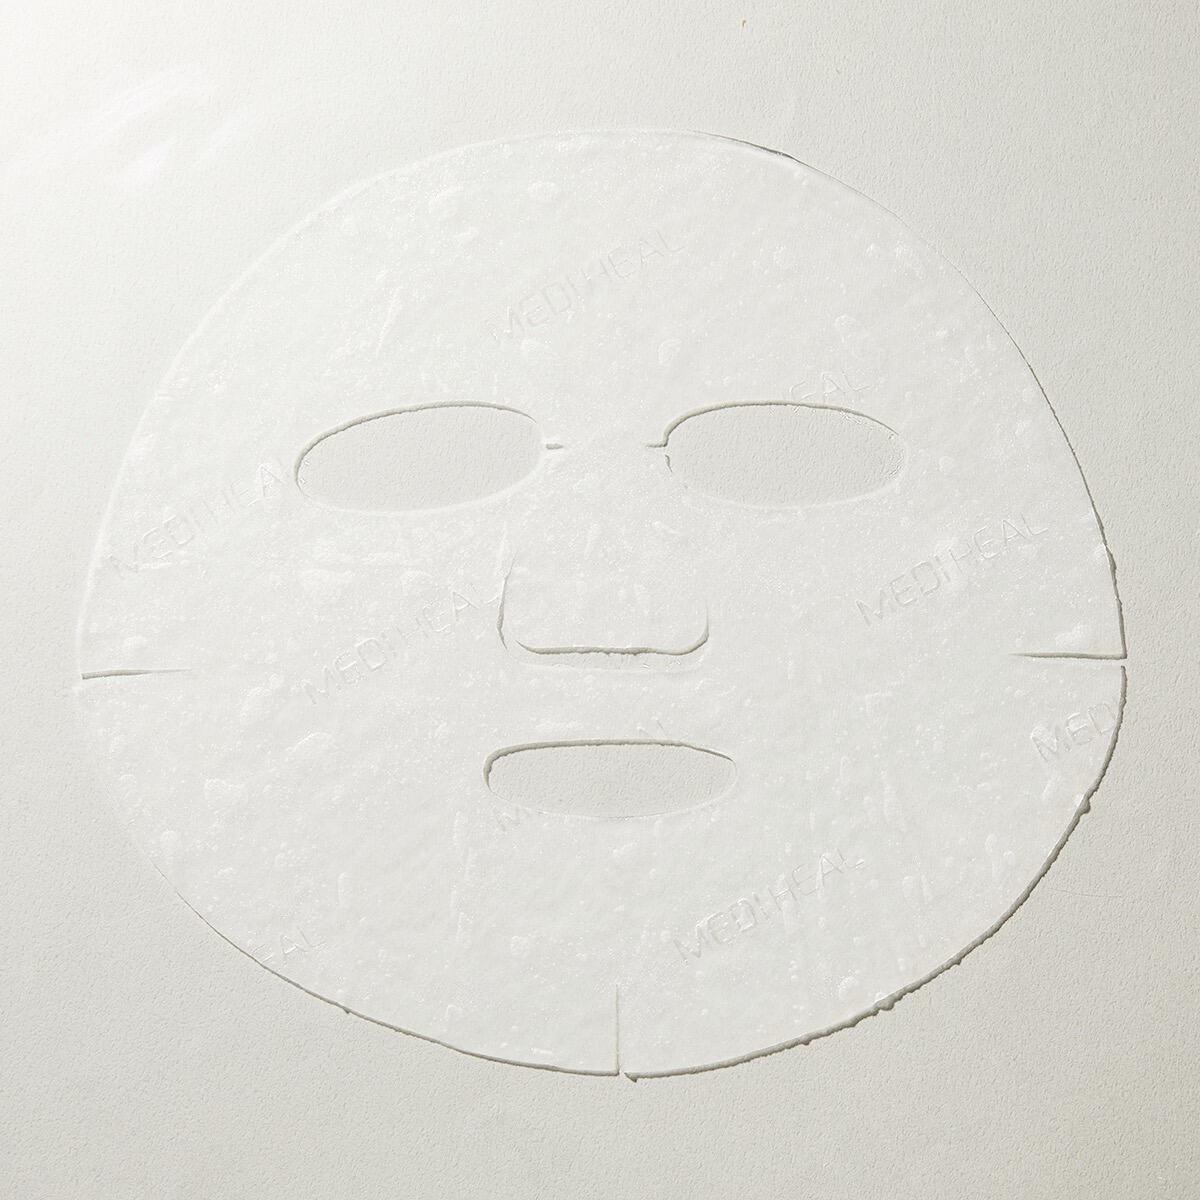 MEDIHEAL(メディヒール)『ヒアルロンアクア アンプルマスクJEX』の使用感をレポ!に関する画像10